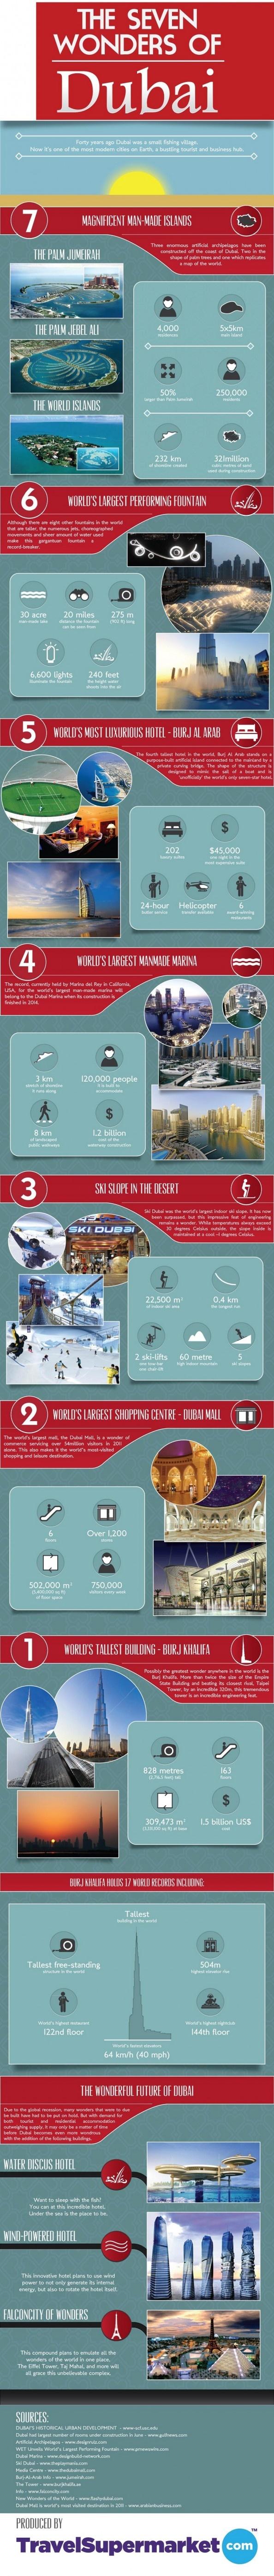 Seven wonders of Dubai #Infographic